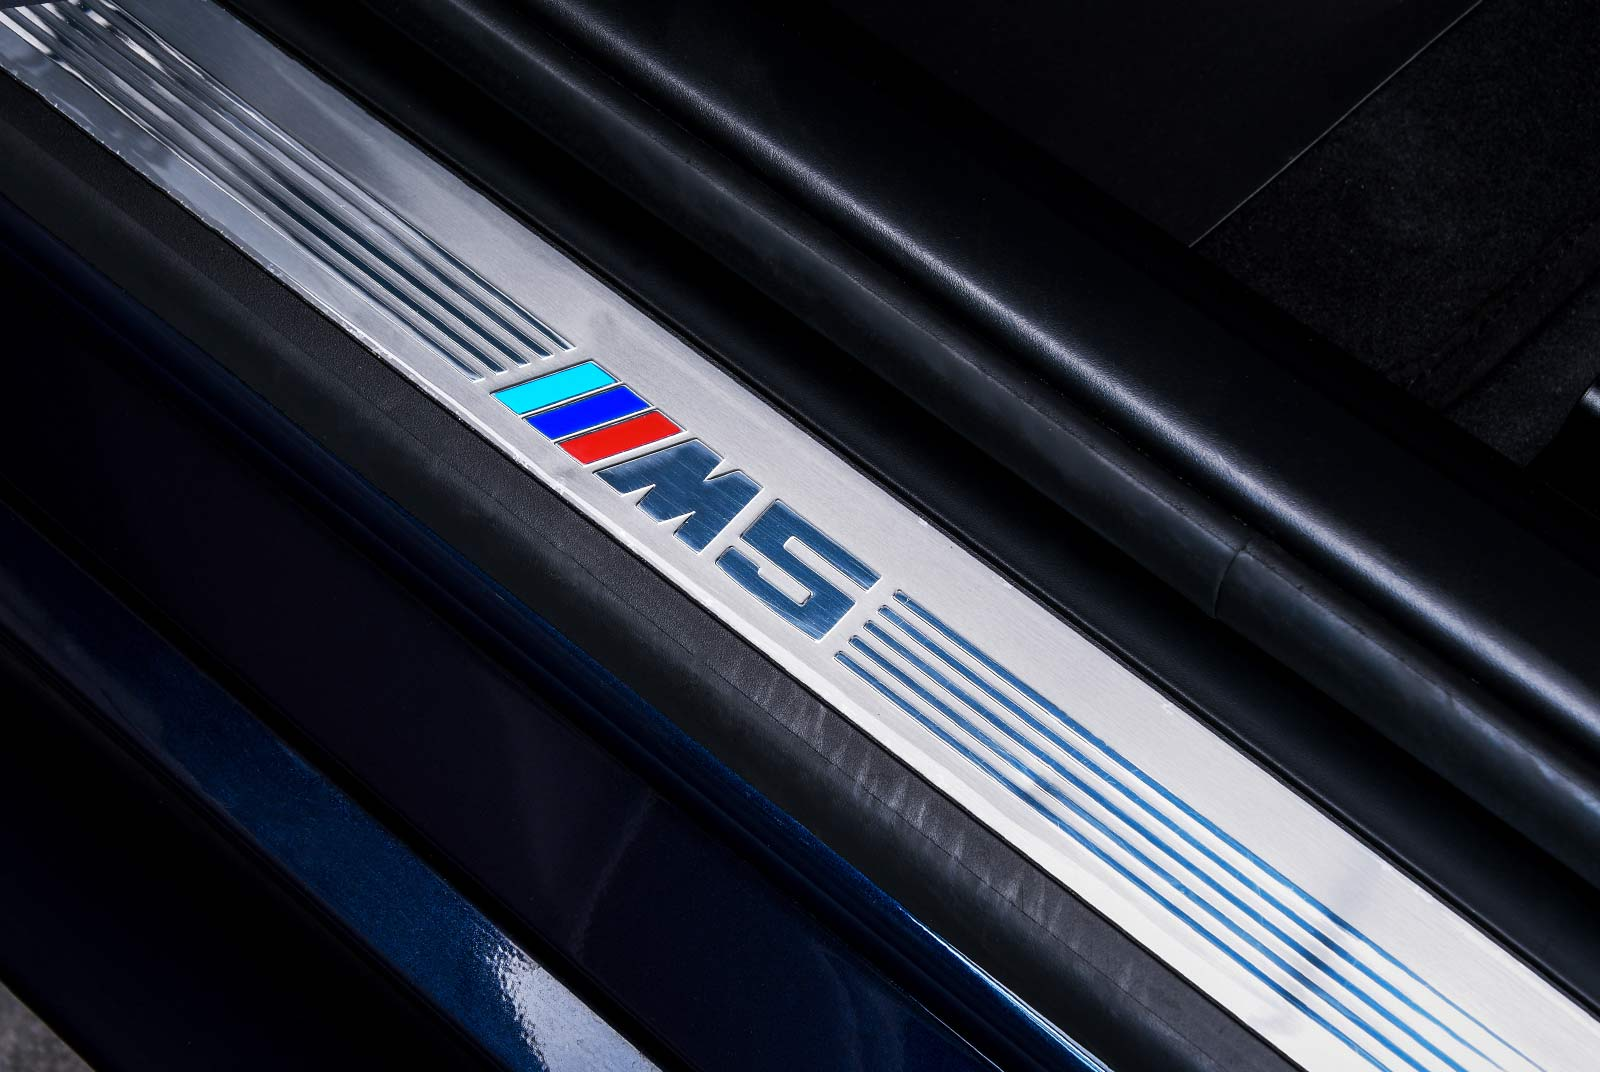 bmw_m_5_blaulila_creme_BMW-2353_21